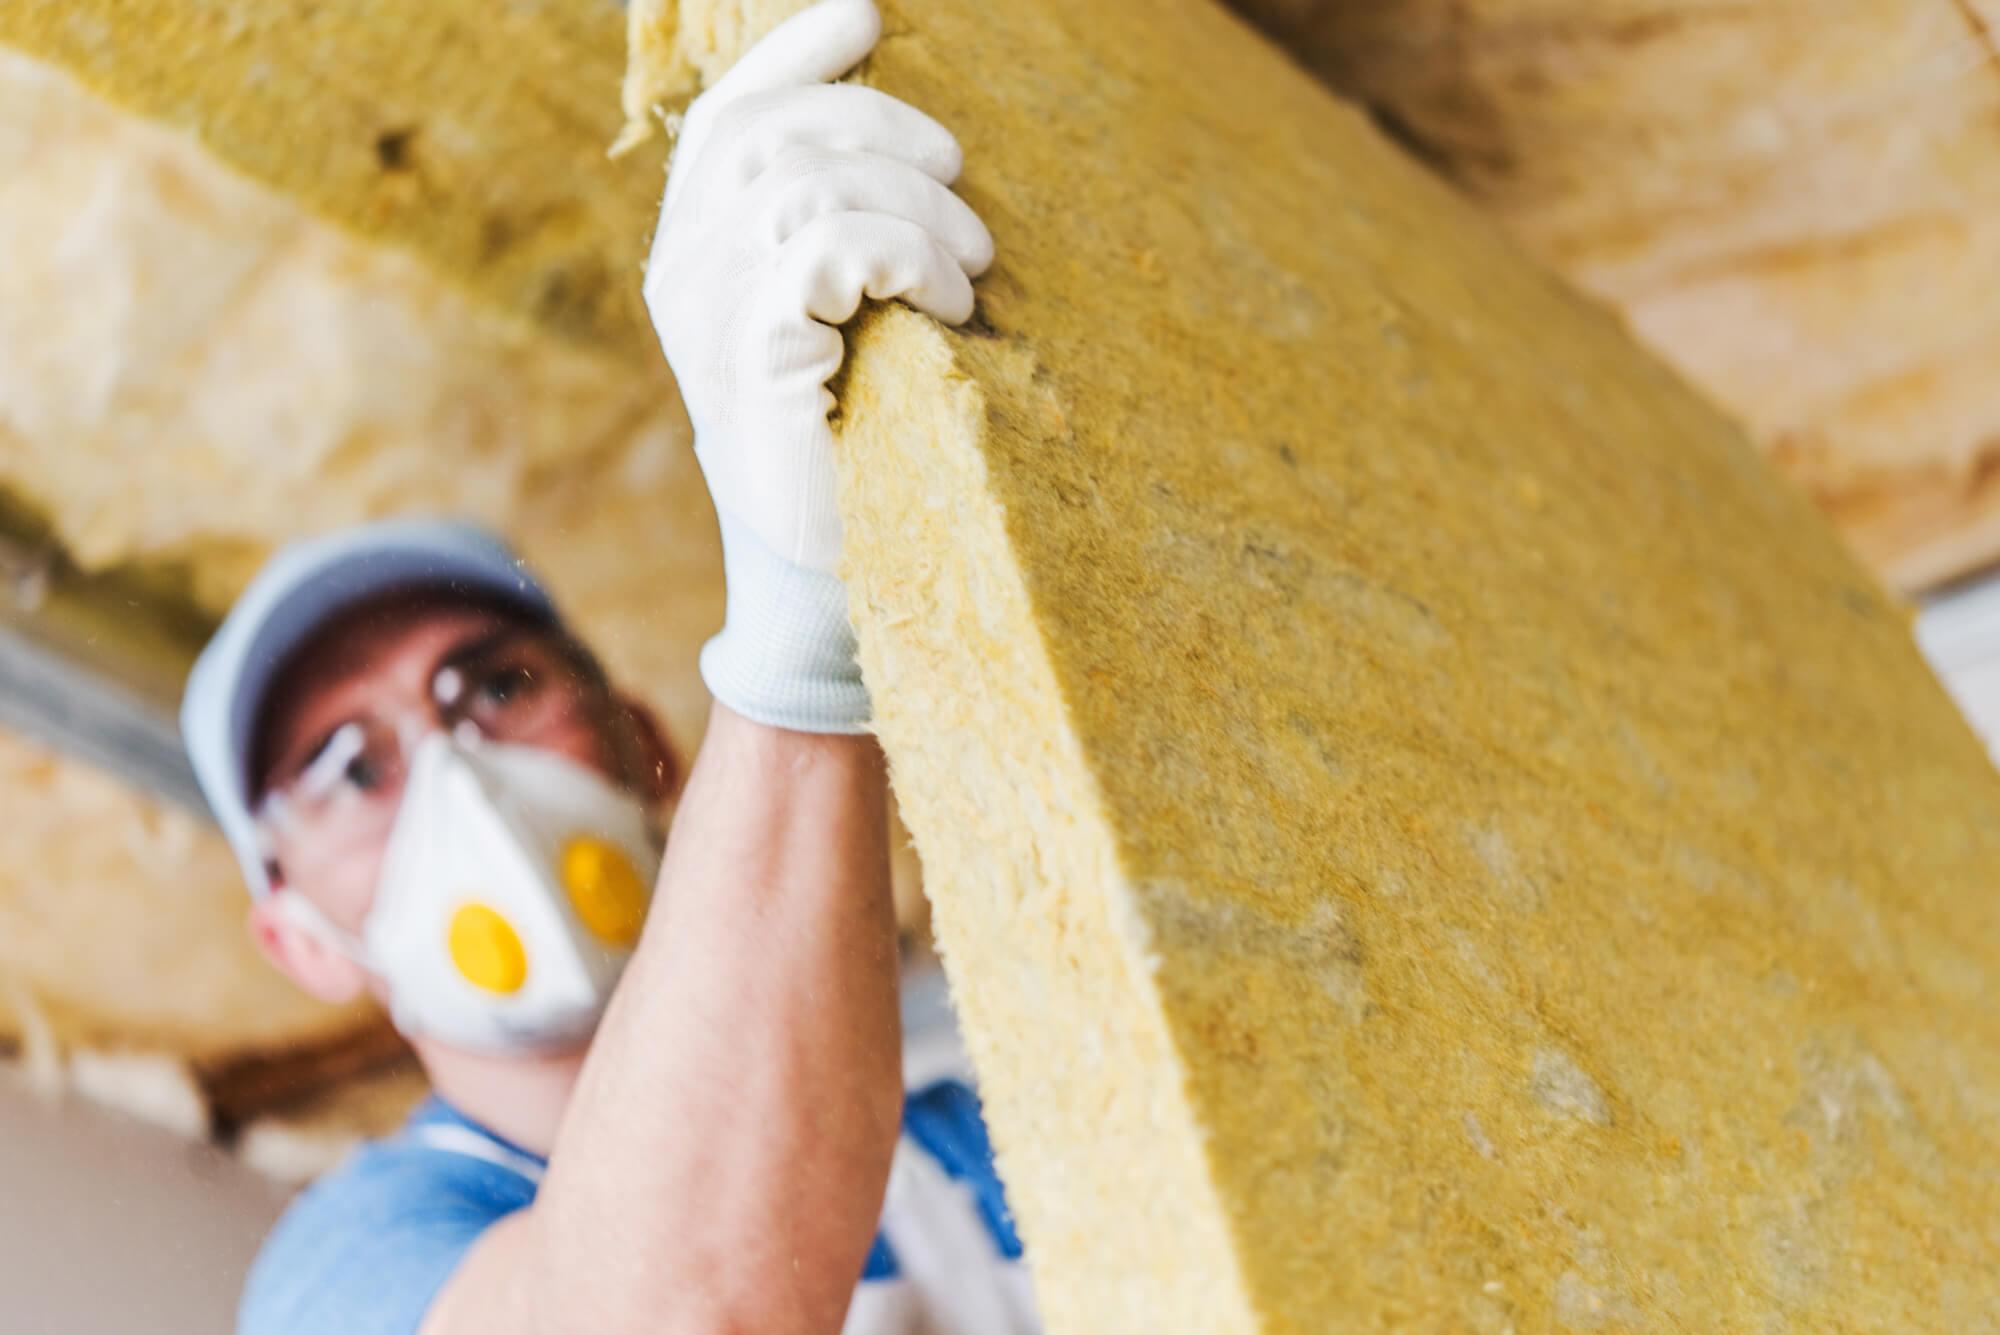 Choosing loft insulation